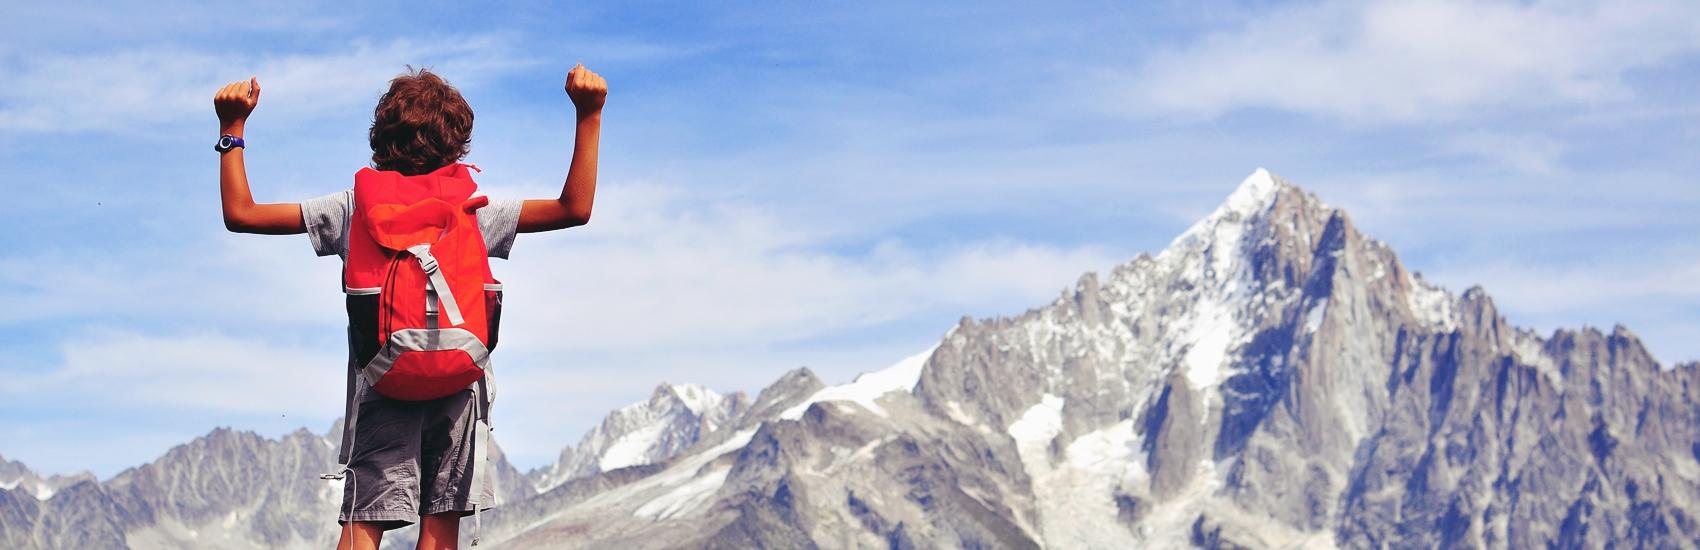 slider-multi-montaña